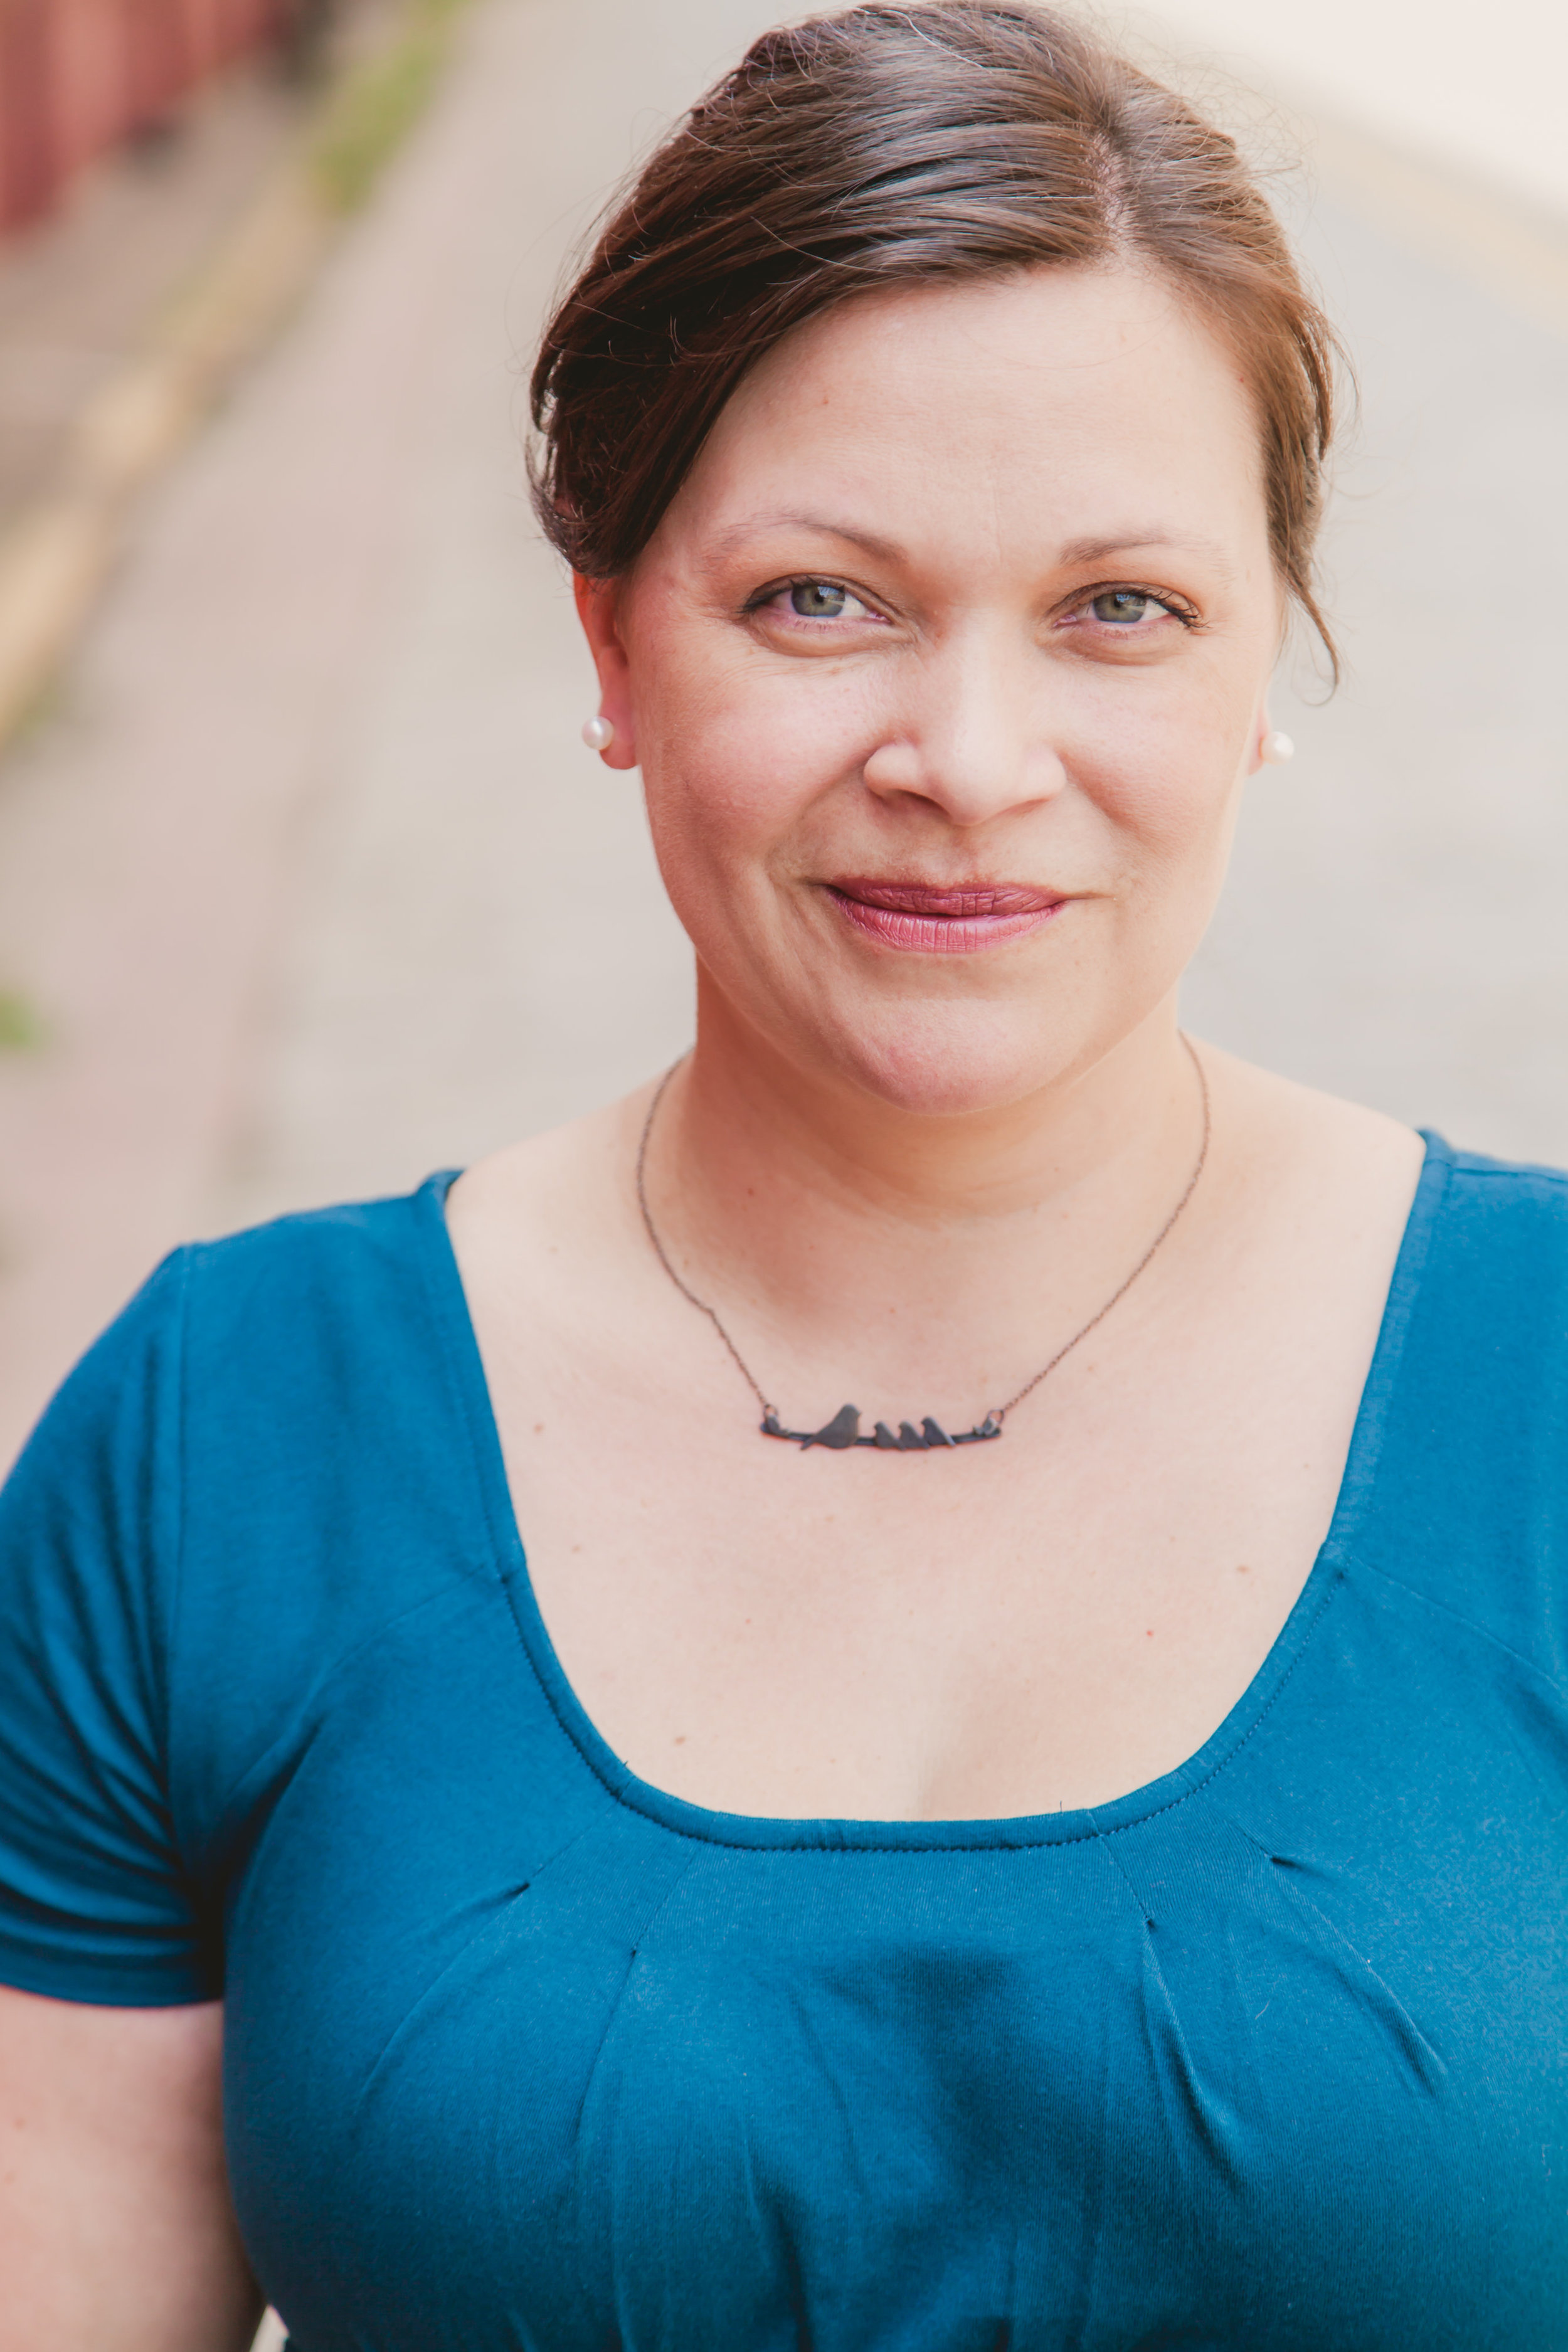 Mary Auxier Headshot - photo credit Libby Hilf.jpg